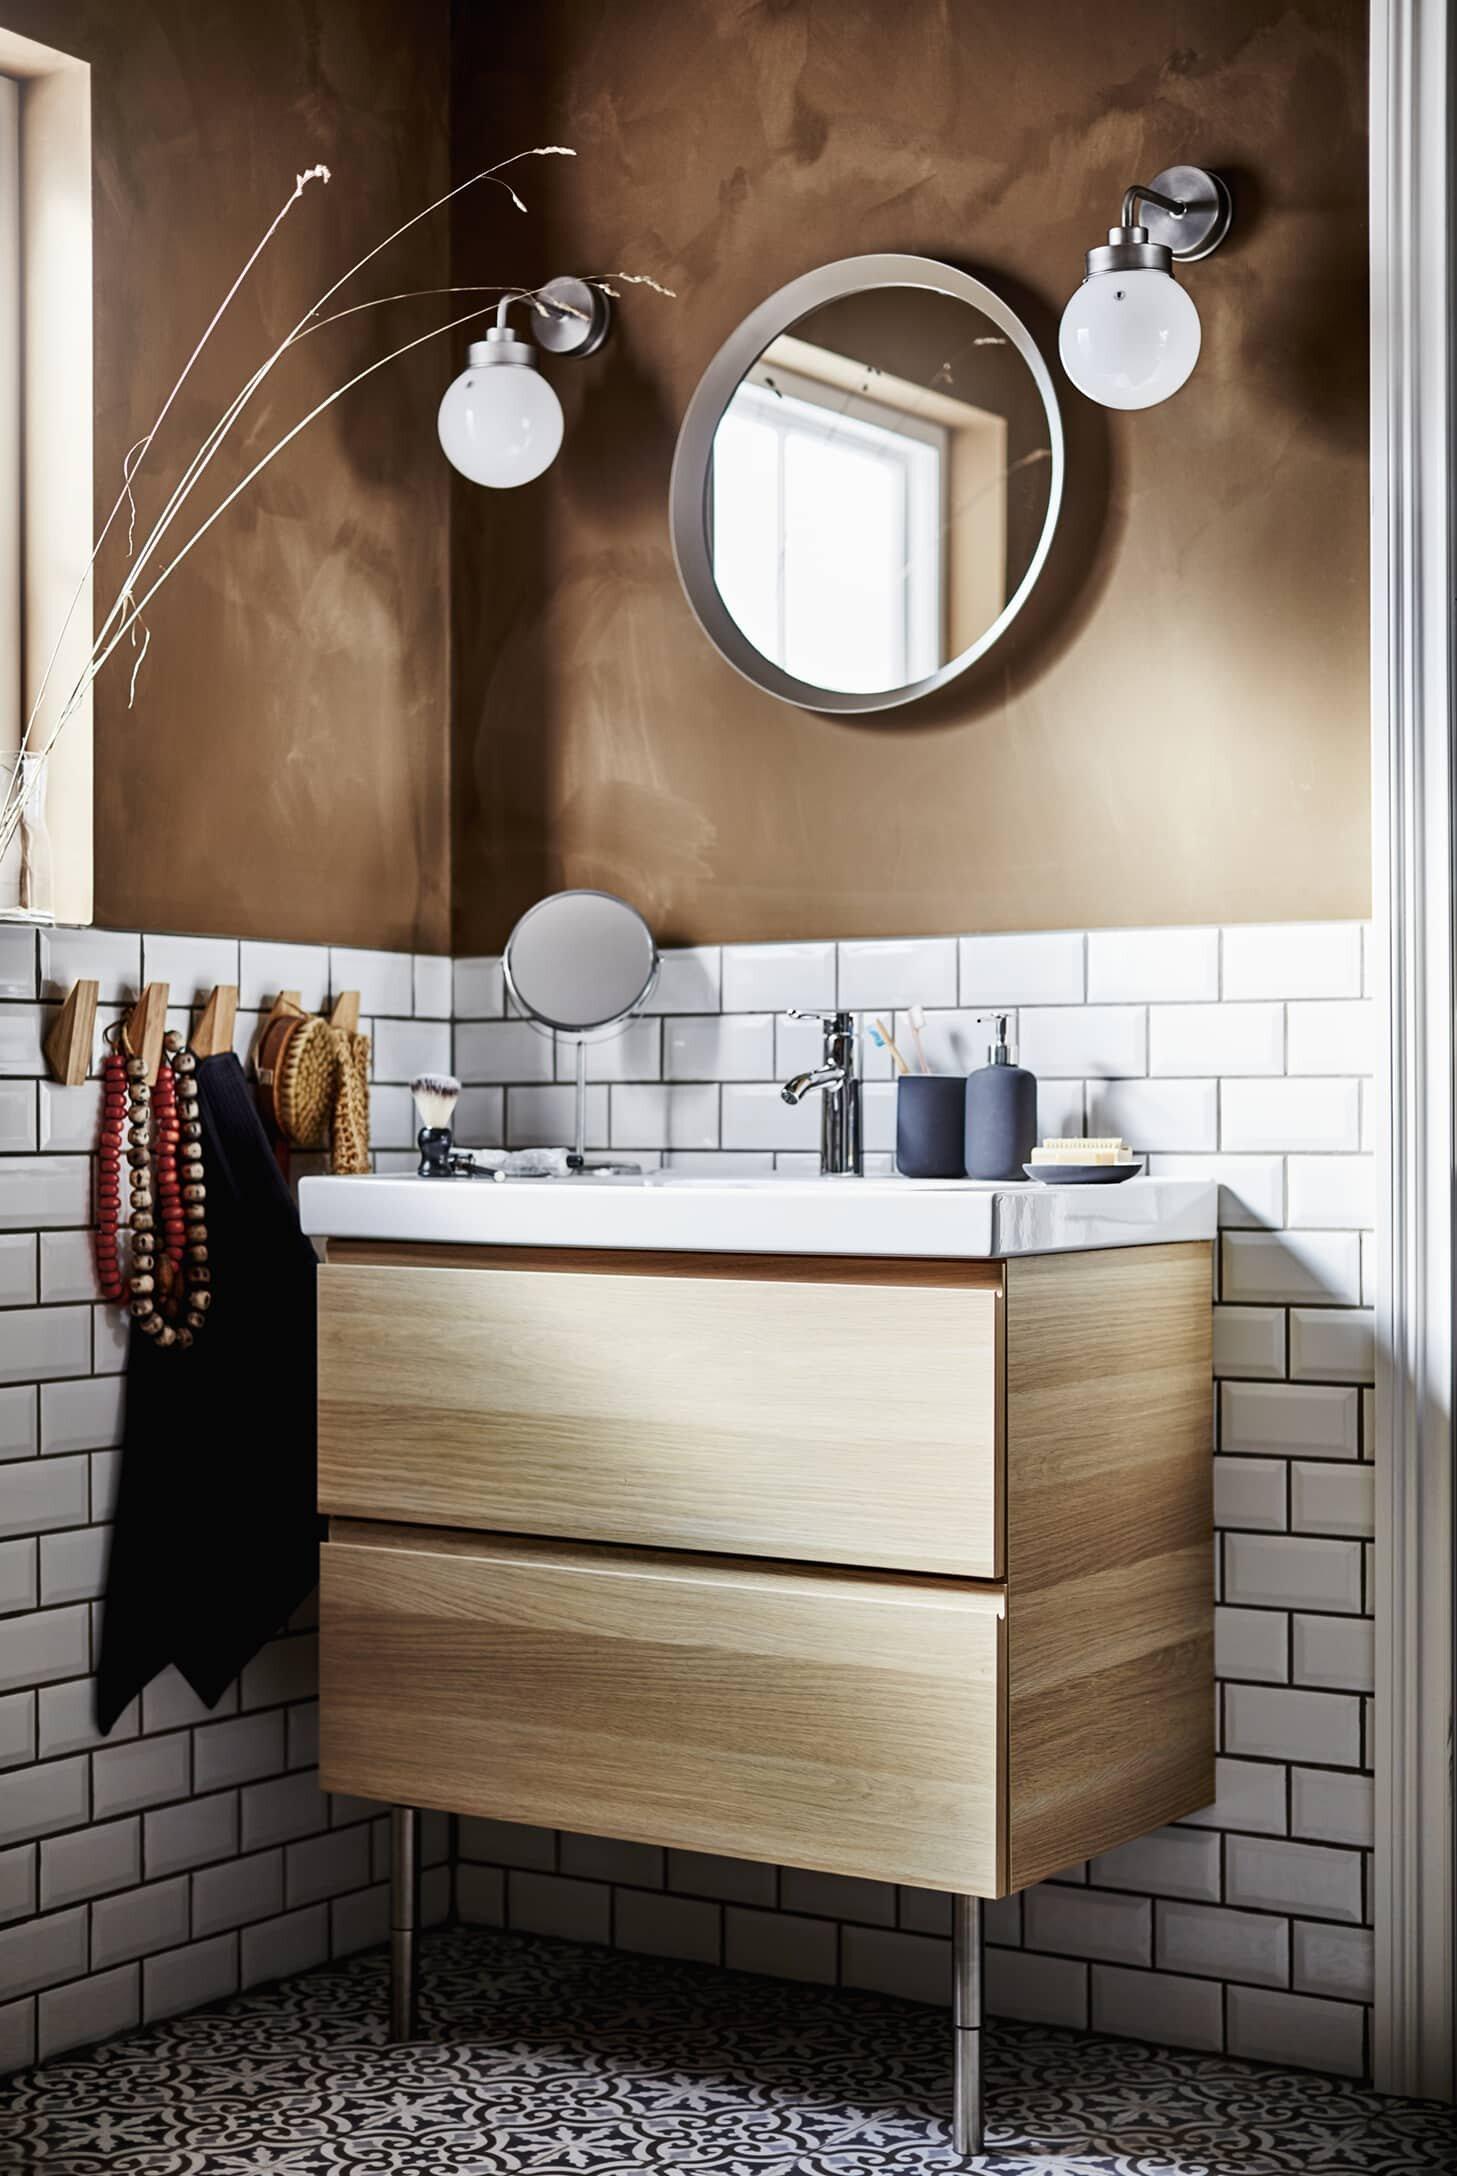 Calm Bathrooms From Ikea 2021 Catalogue, Ikea Bathroom Sets